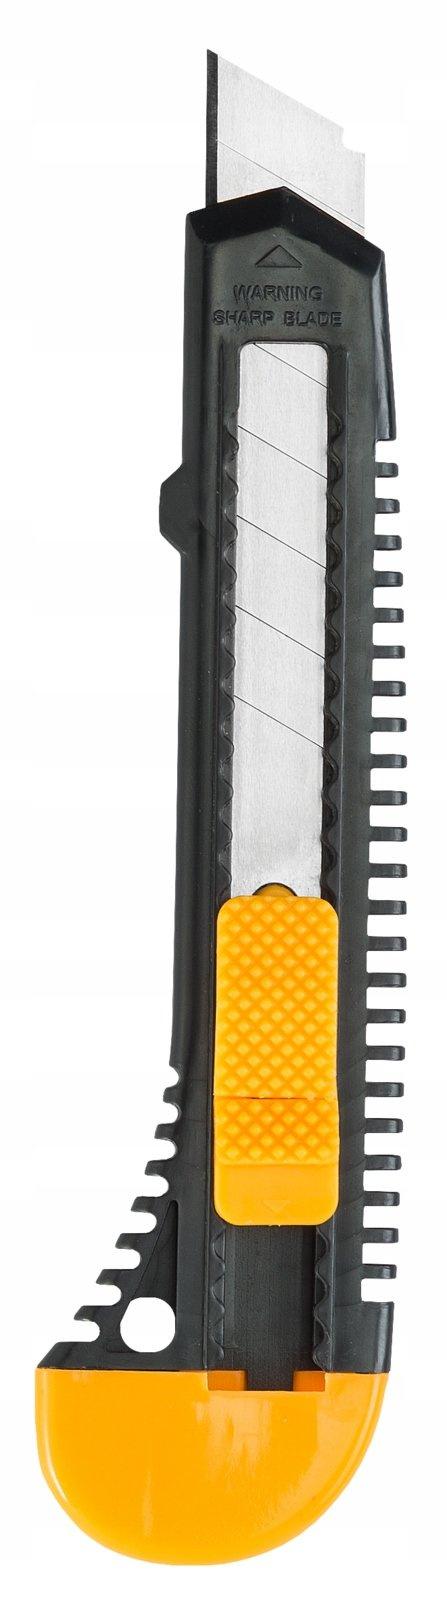 NOŻYK UNIWERSALNY DO TAPET 18mm